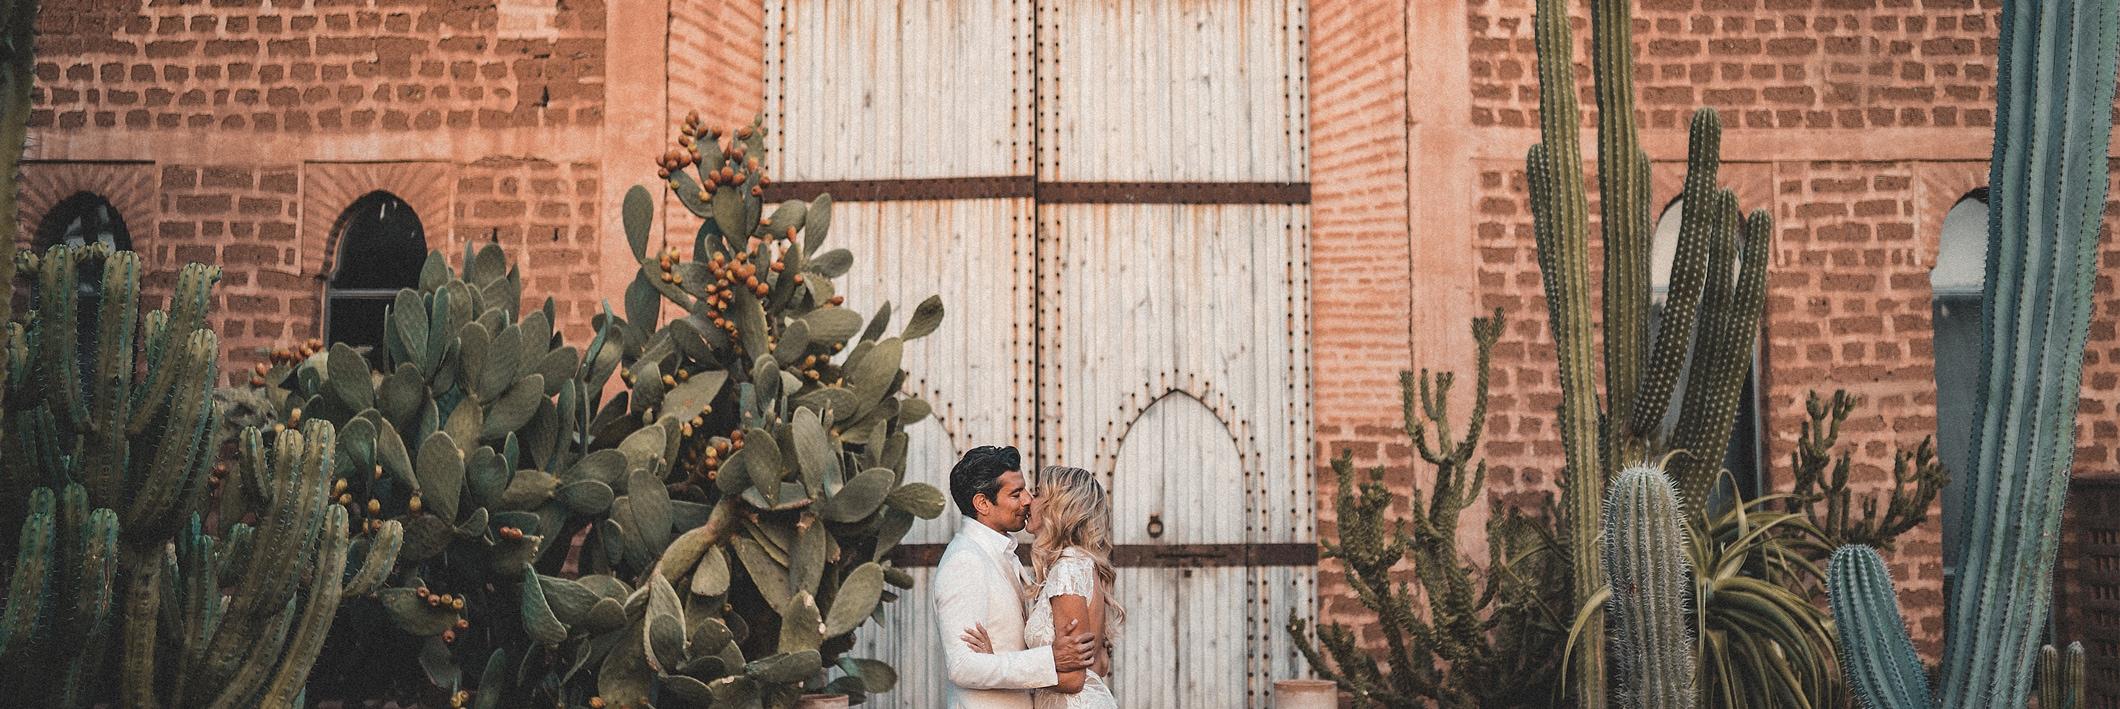 wedding-marrakech-beldi-country